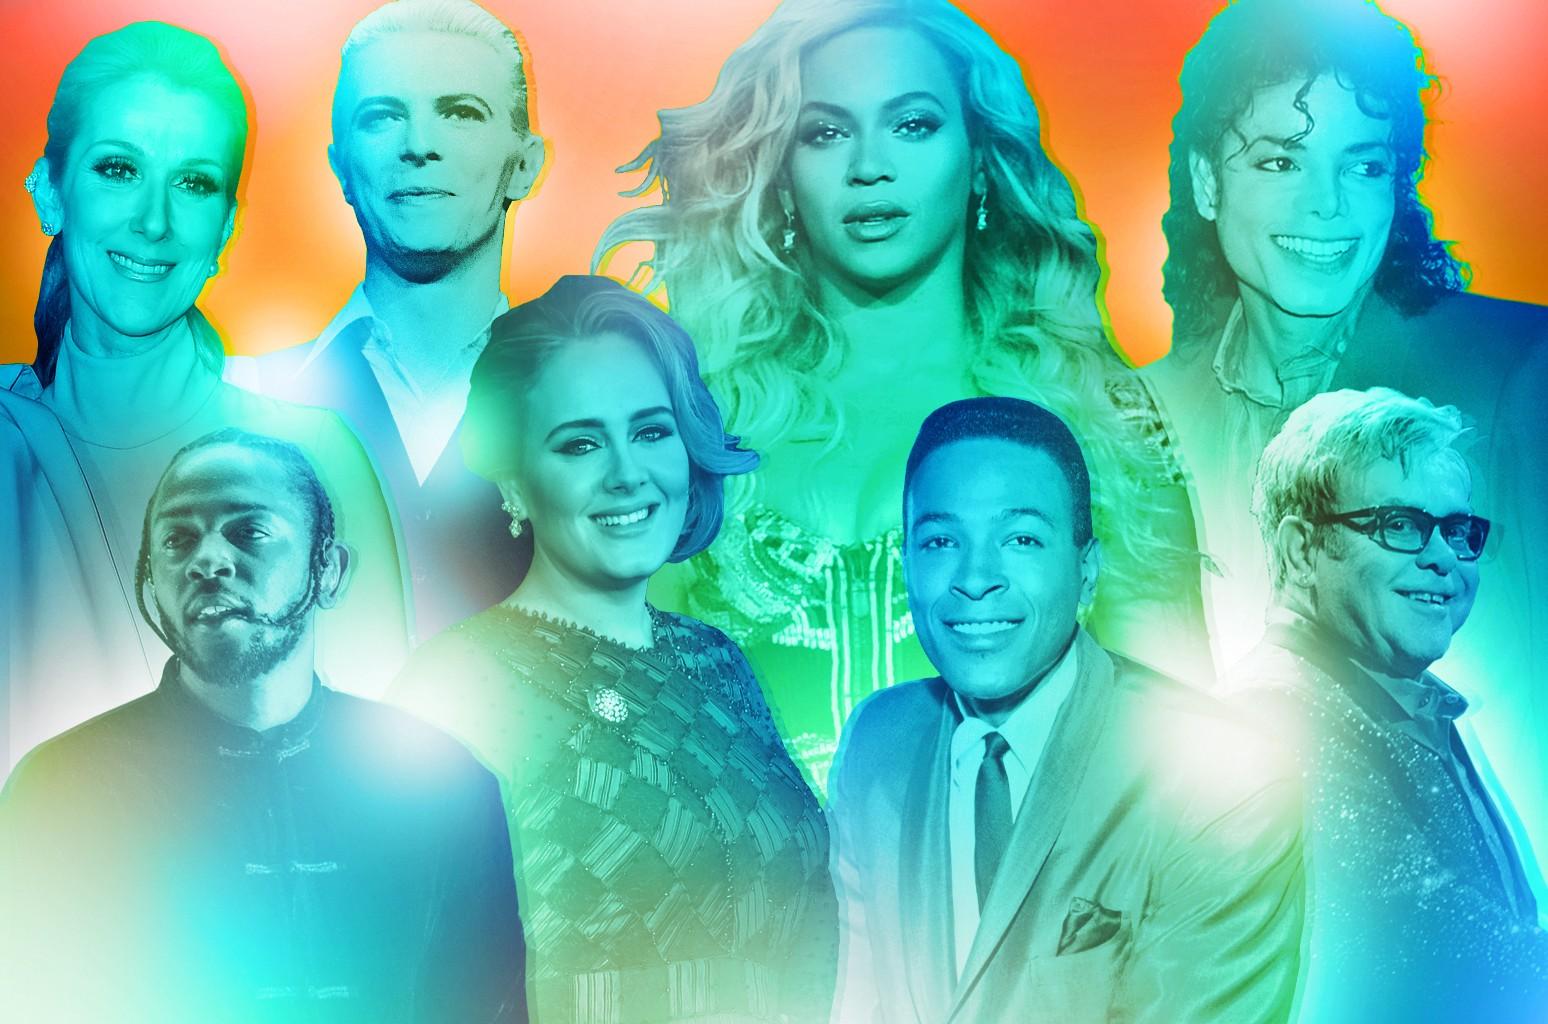 Clockwise from top left: Celine Dion, David Bowie, Beyoncé, Michael Jackson, Elton John, Marvin Gaye, Adele & Kendrick Lamar